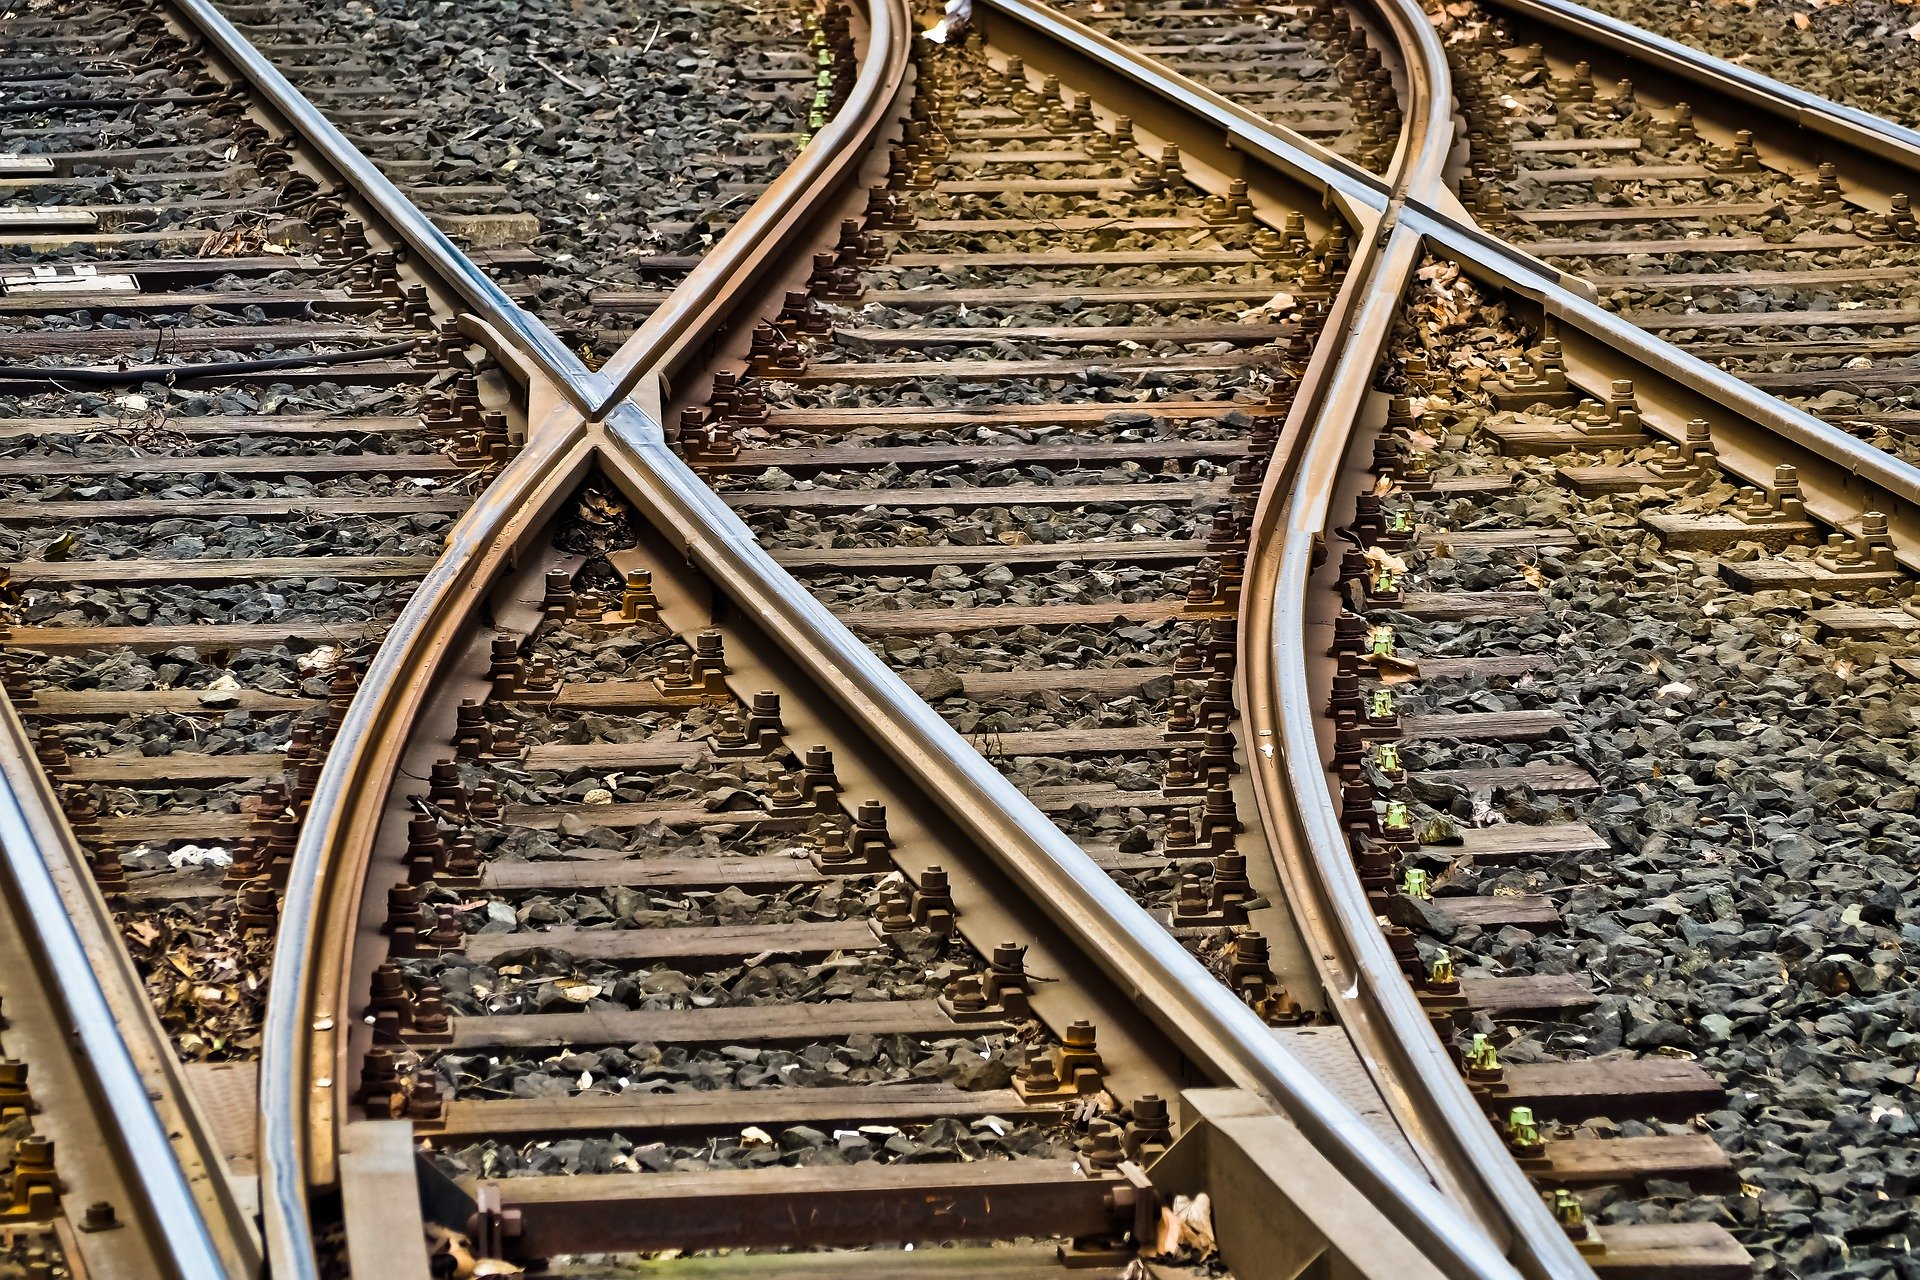 Trafic SNCF quasi nul en gare de Toulouse Matabiau ce vendredi